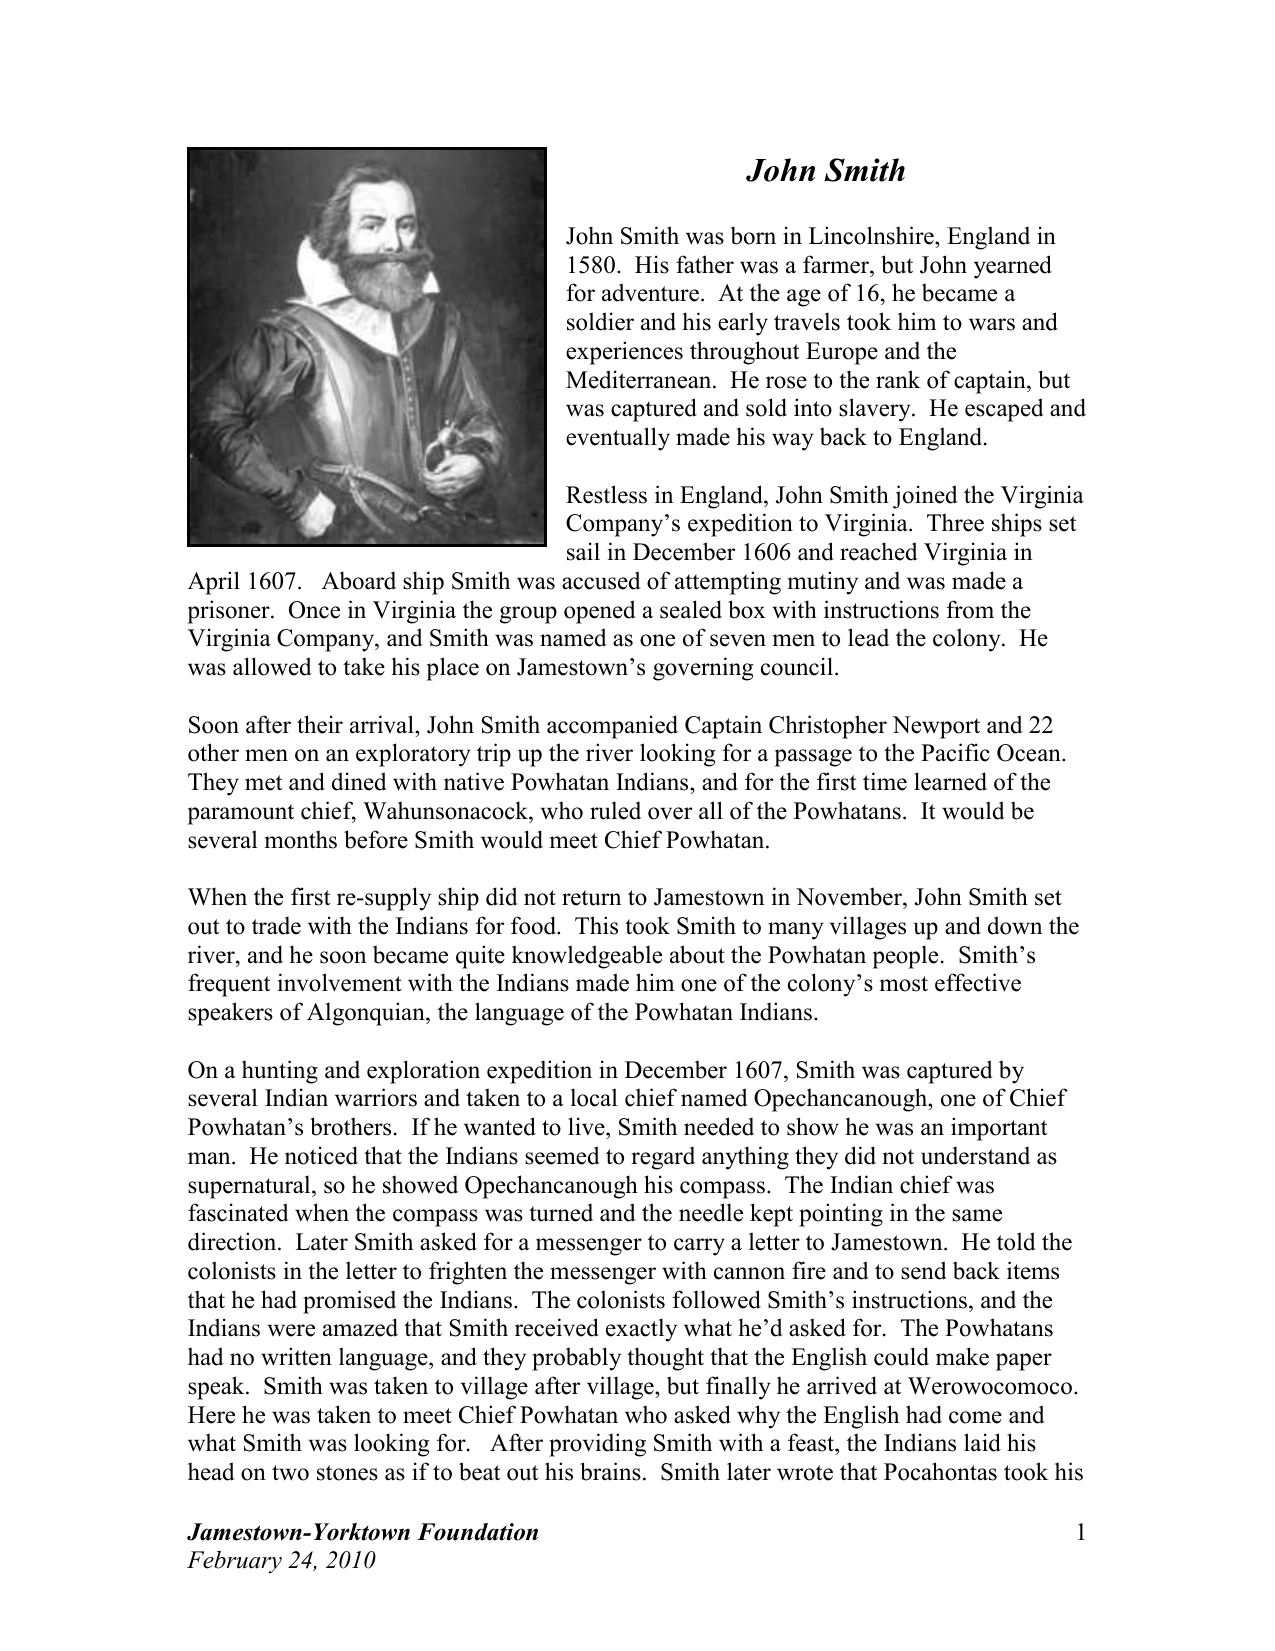 Background essay – John Smith